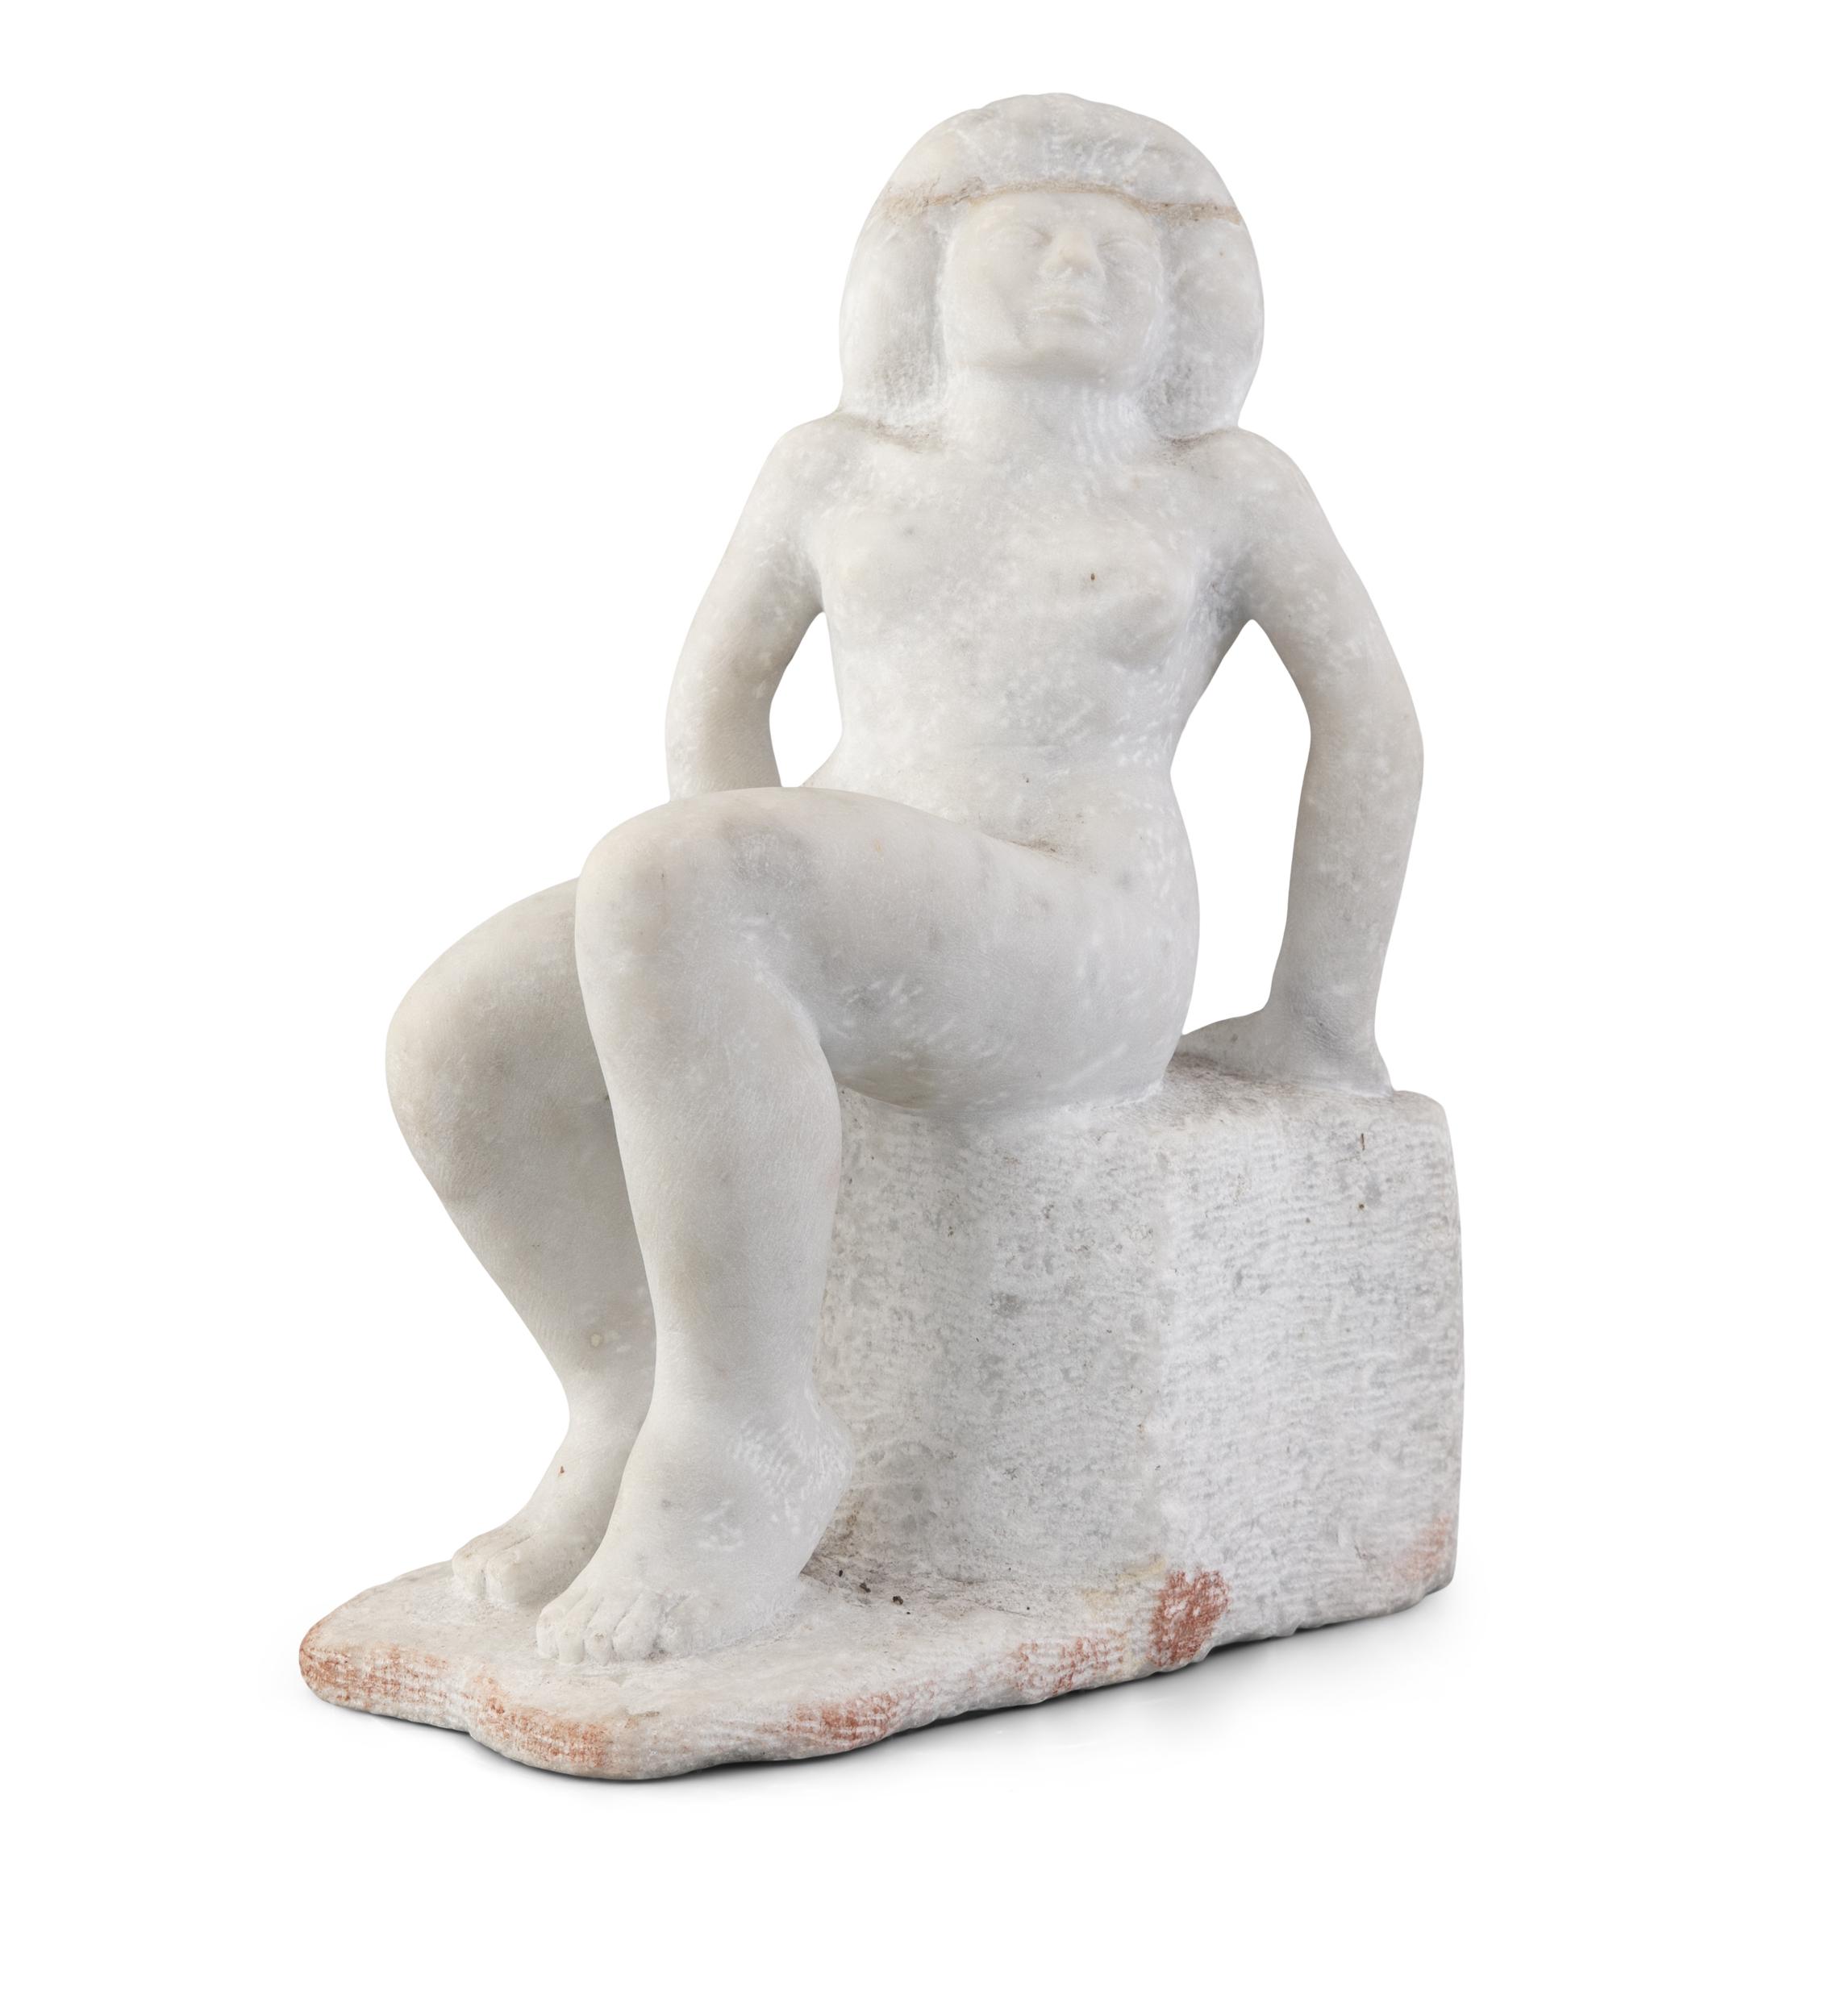 James McKenna (1933-2000)Dúil (Longing) (1969)White marble, 35 x 28 x 18cm (13¾ x 11 x 7)